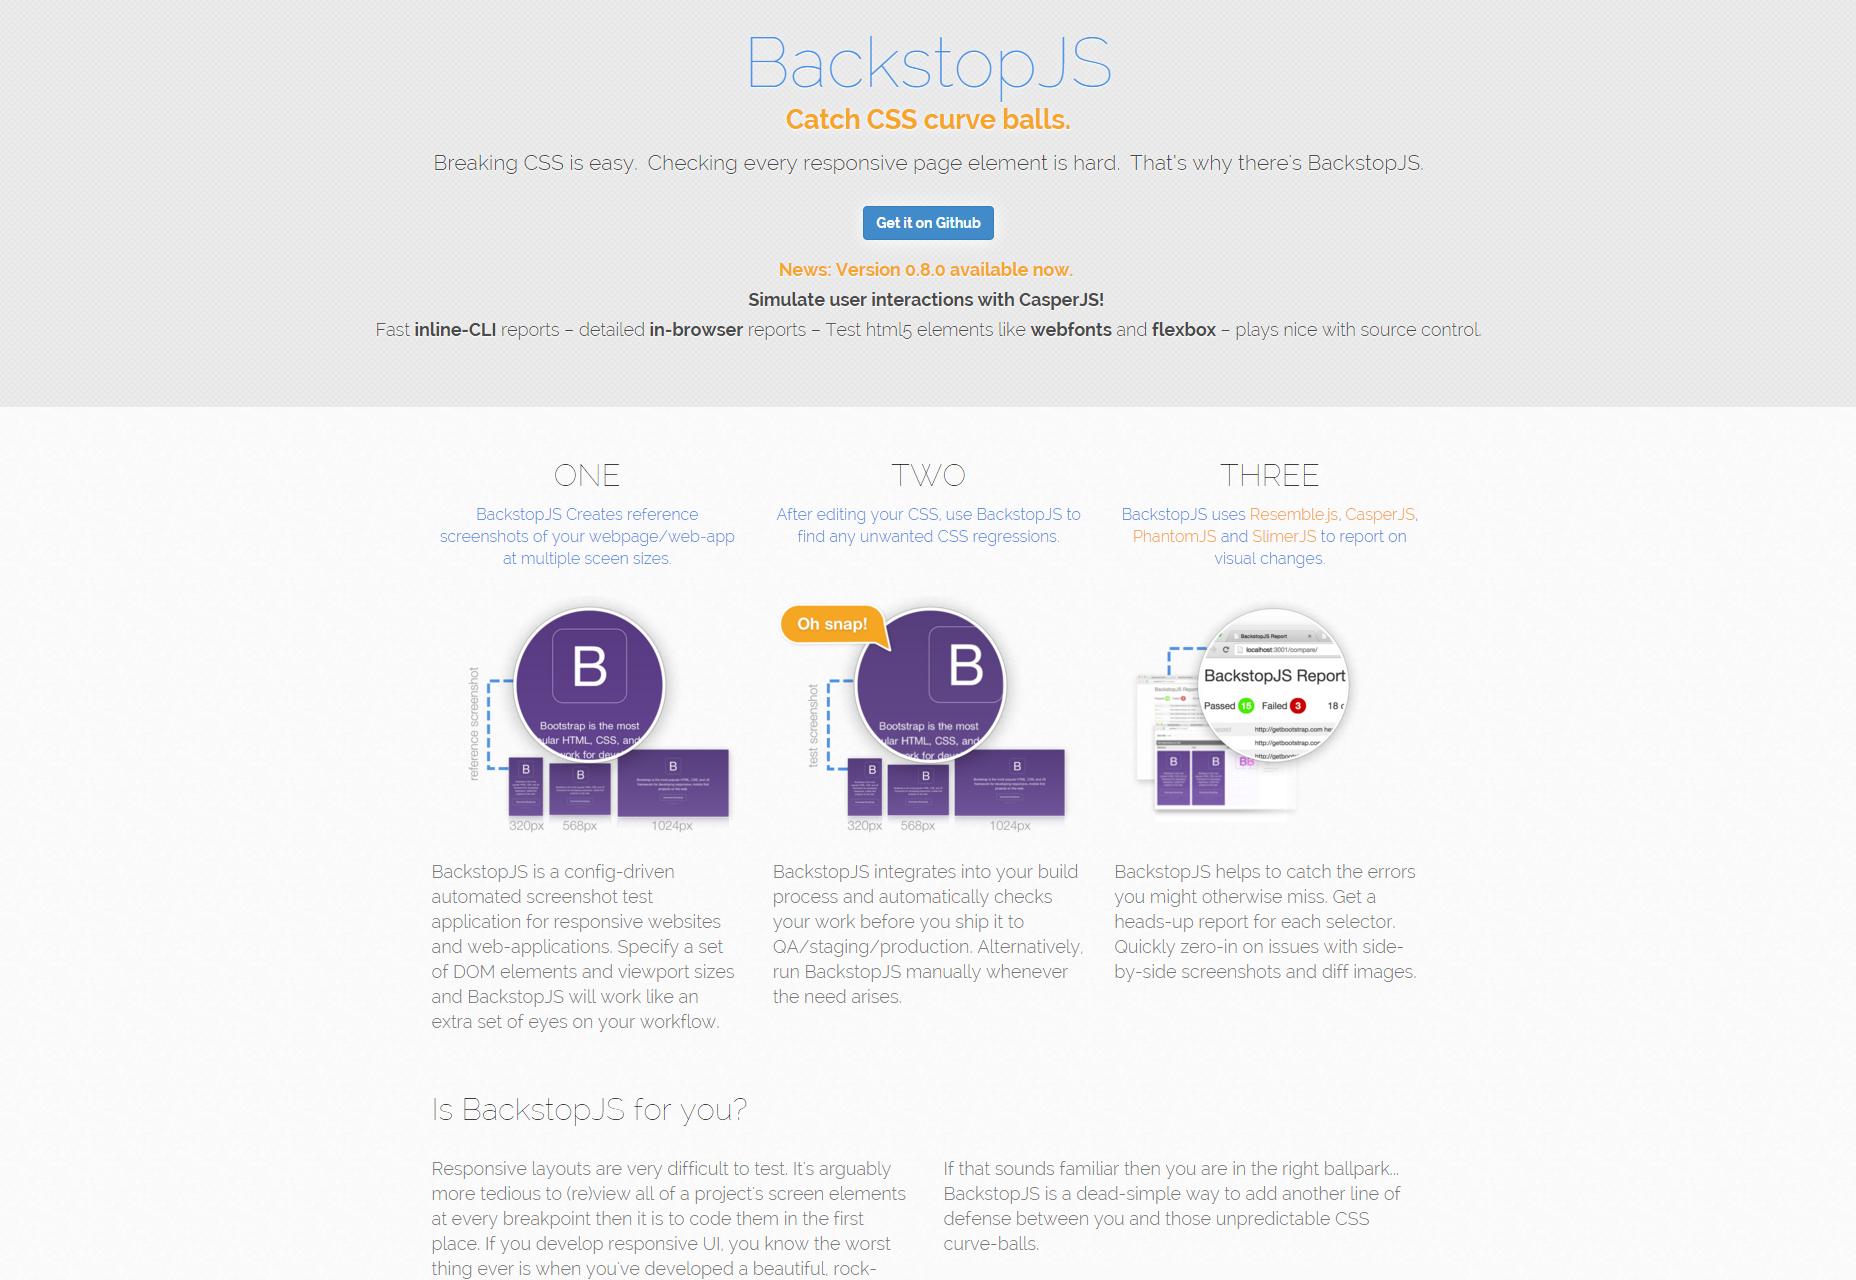 BackstopJS: Aplicación de prueba de captura de pantalla basada en configuración